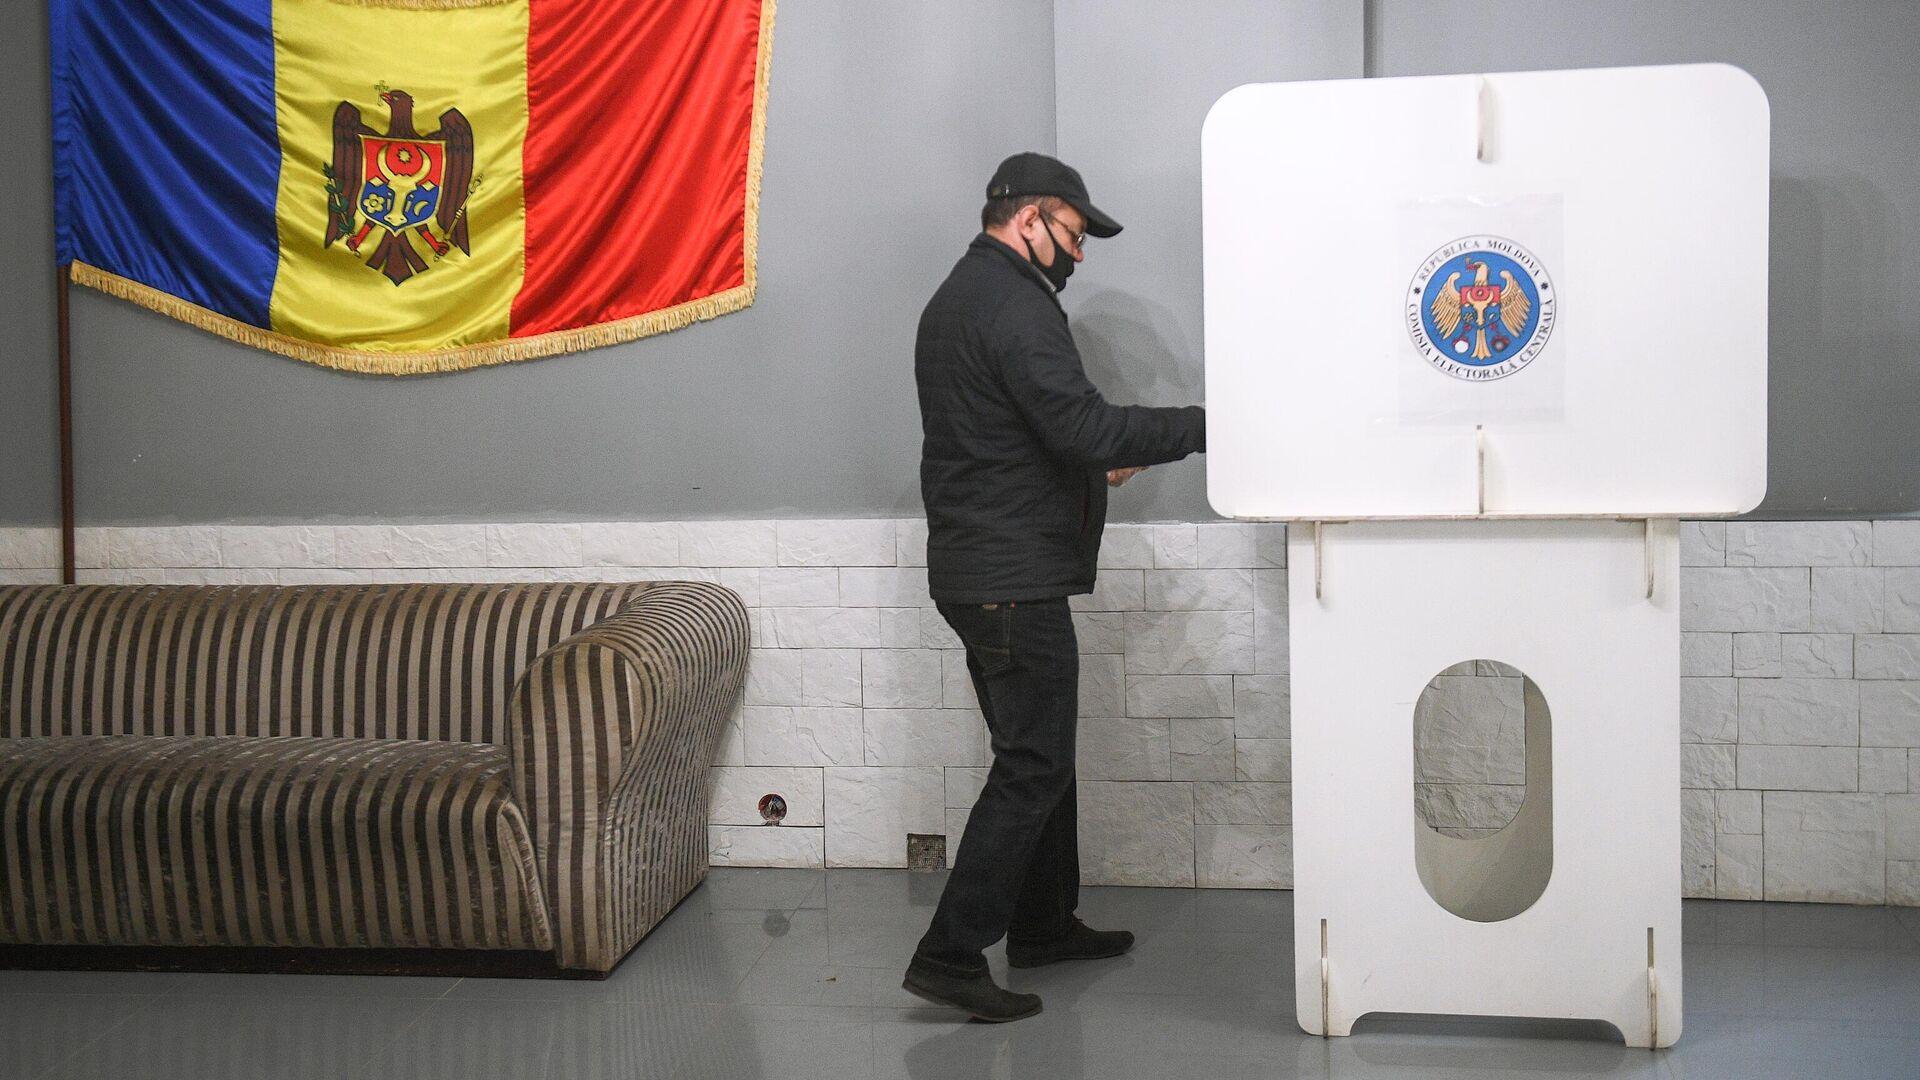 Мужчина голосует на всеобщих выборах президента Молдавии  - РИА Новости, 1920, 02.11.2020